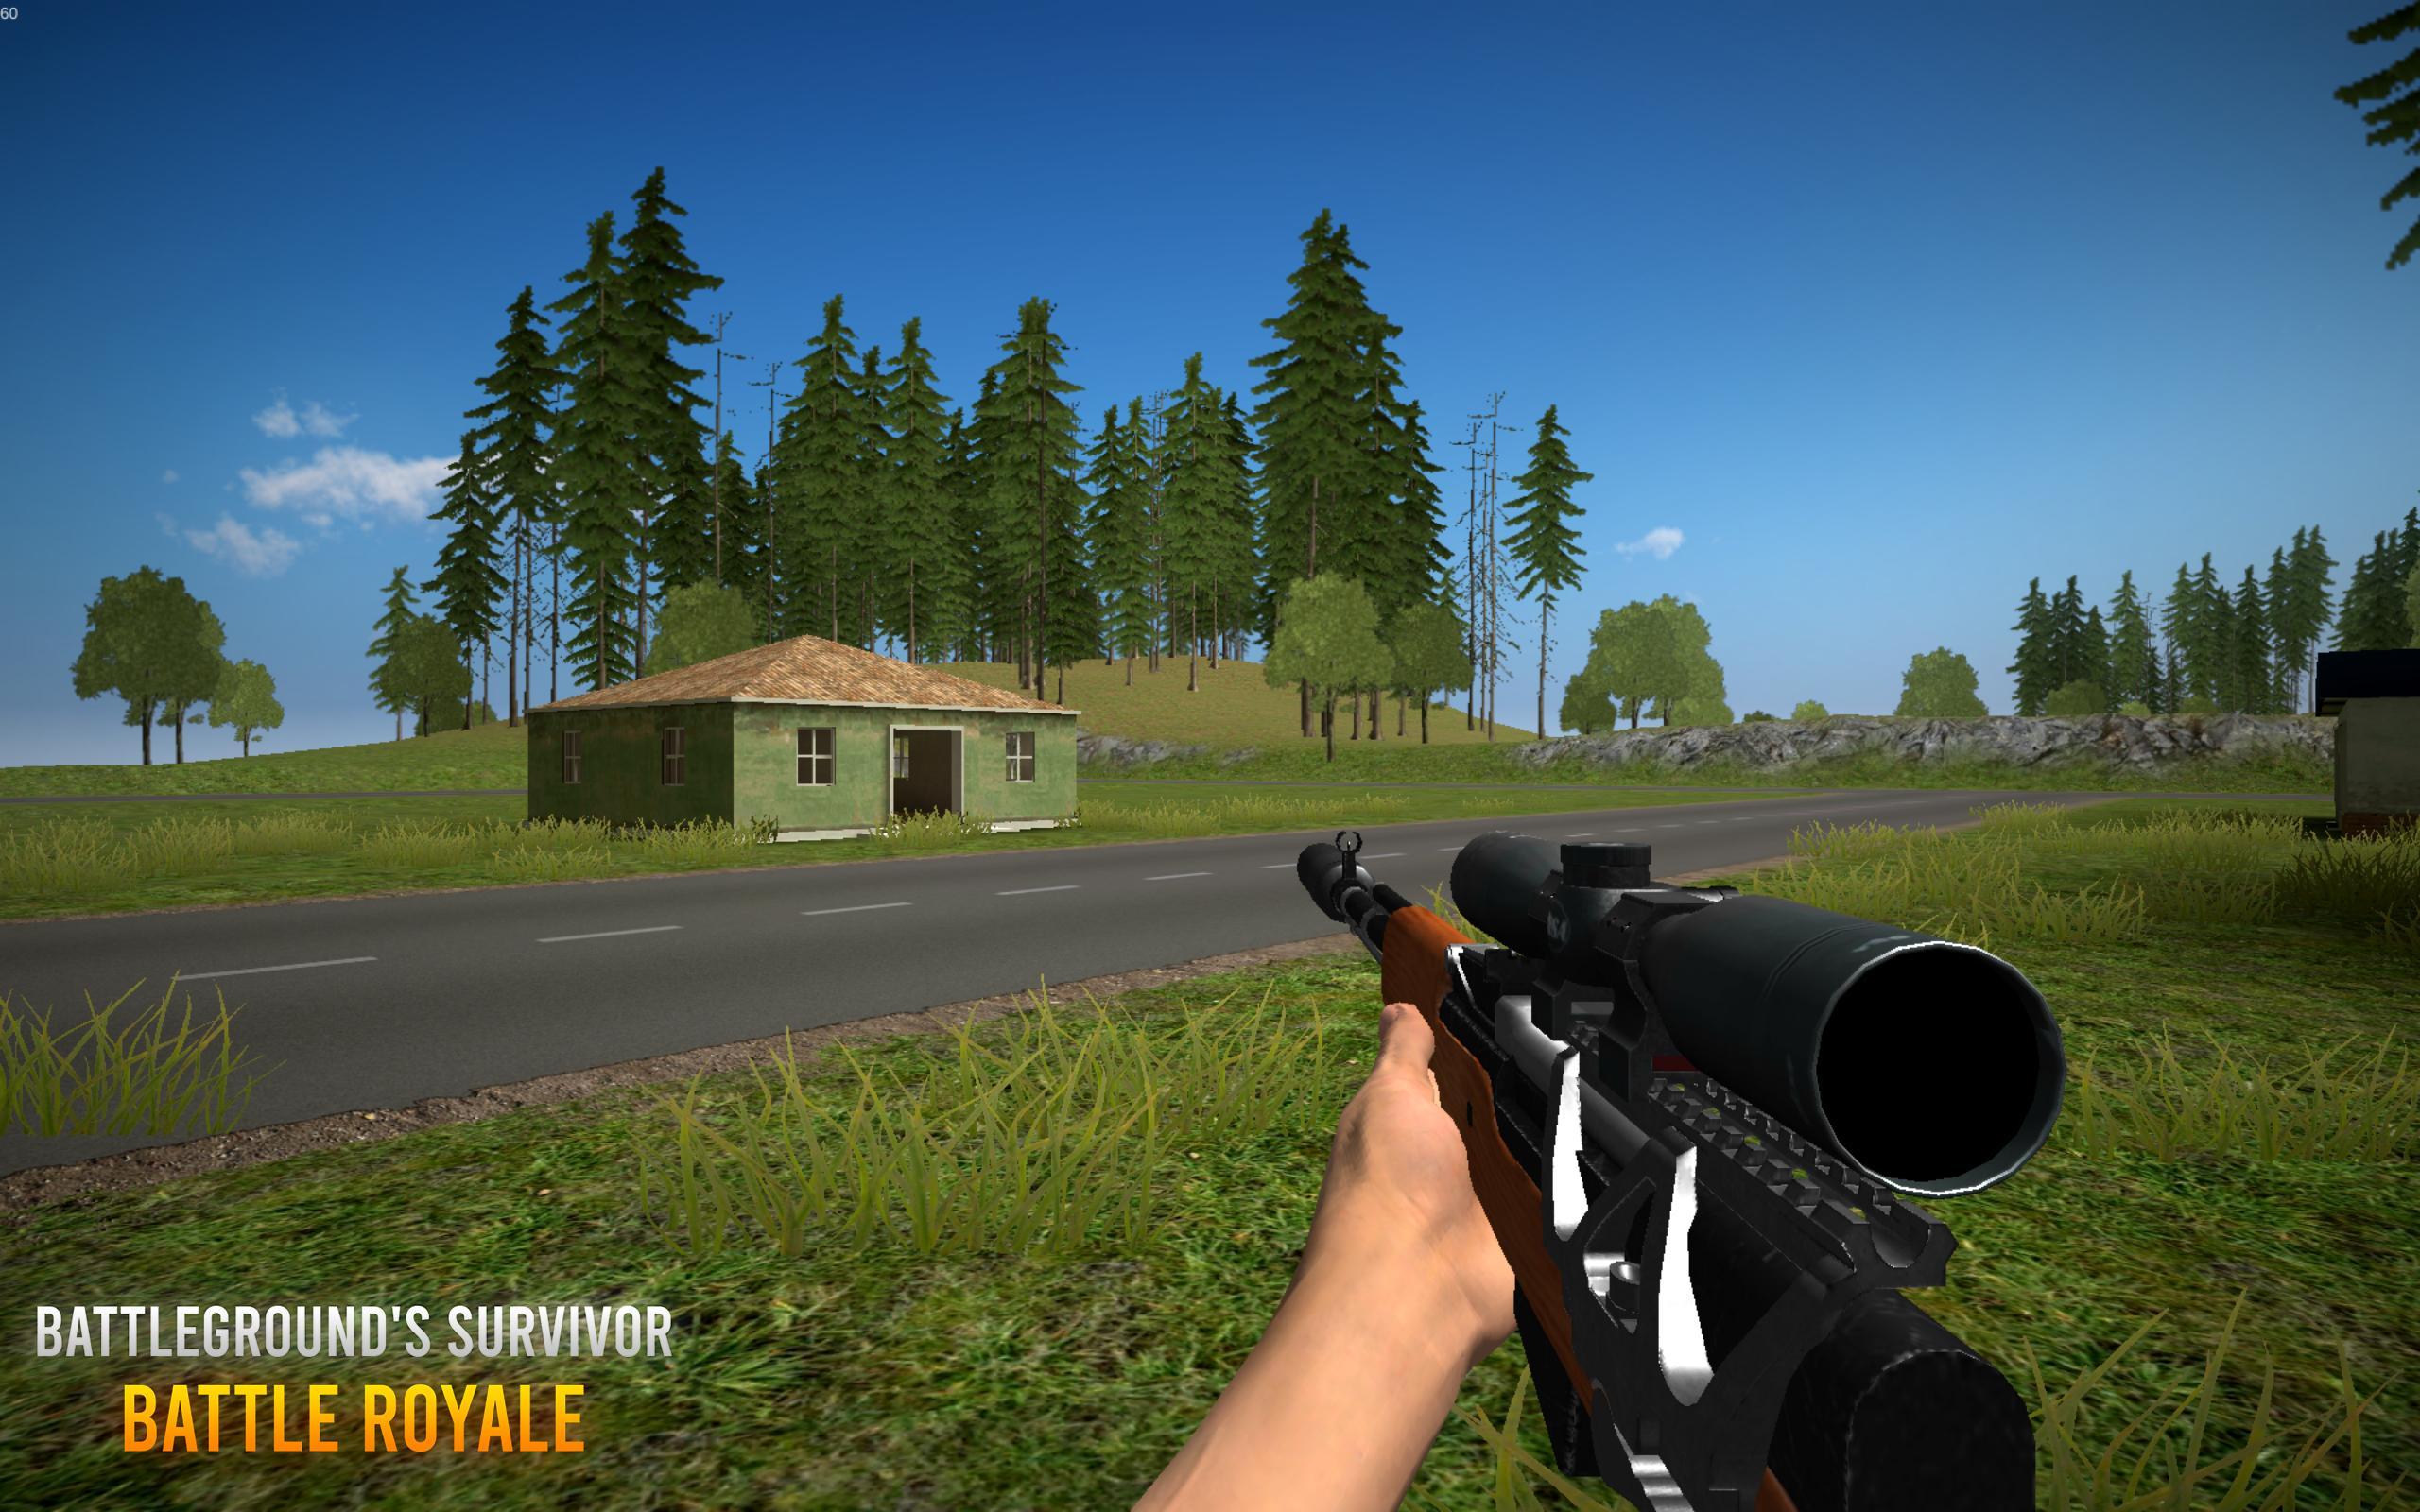 Battleground S Survivor Battle Royale For Android Apk Download